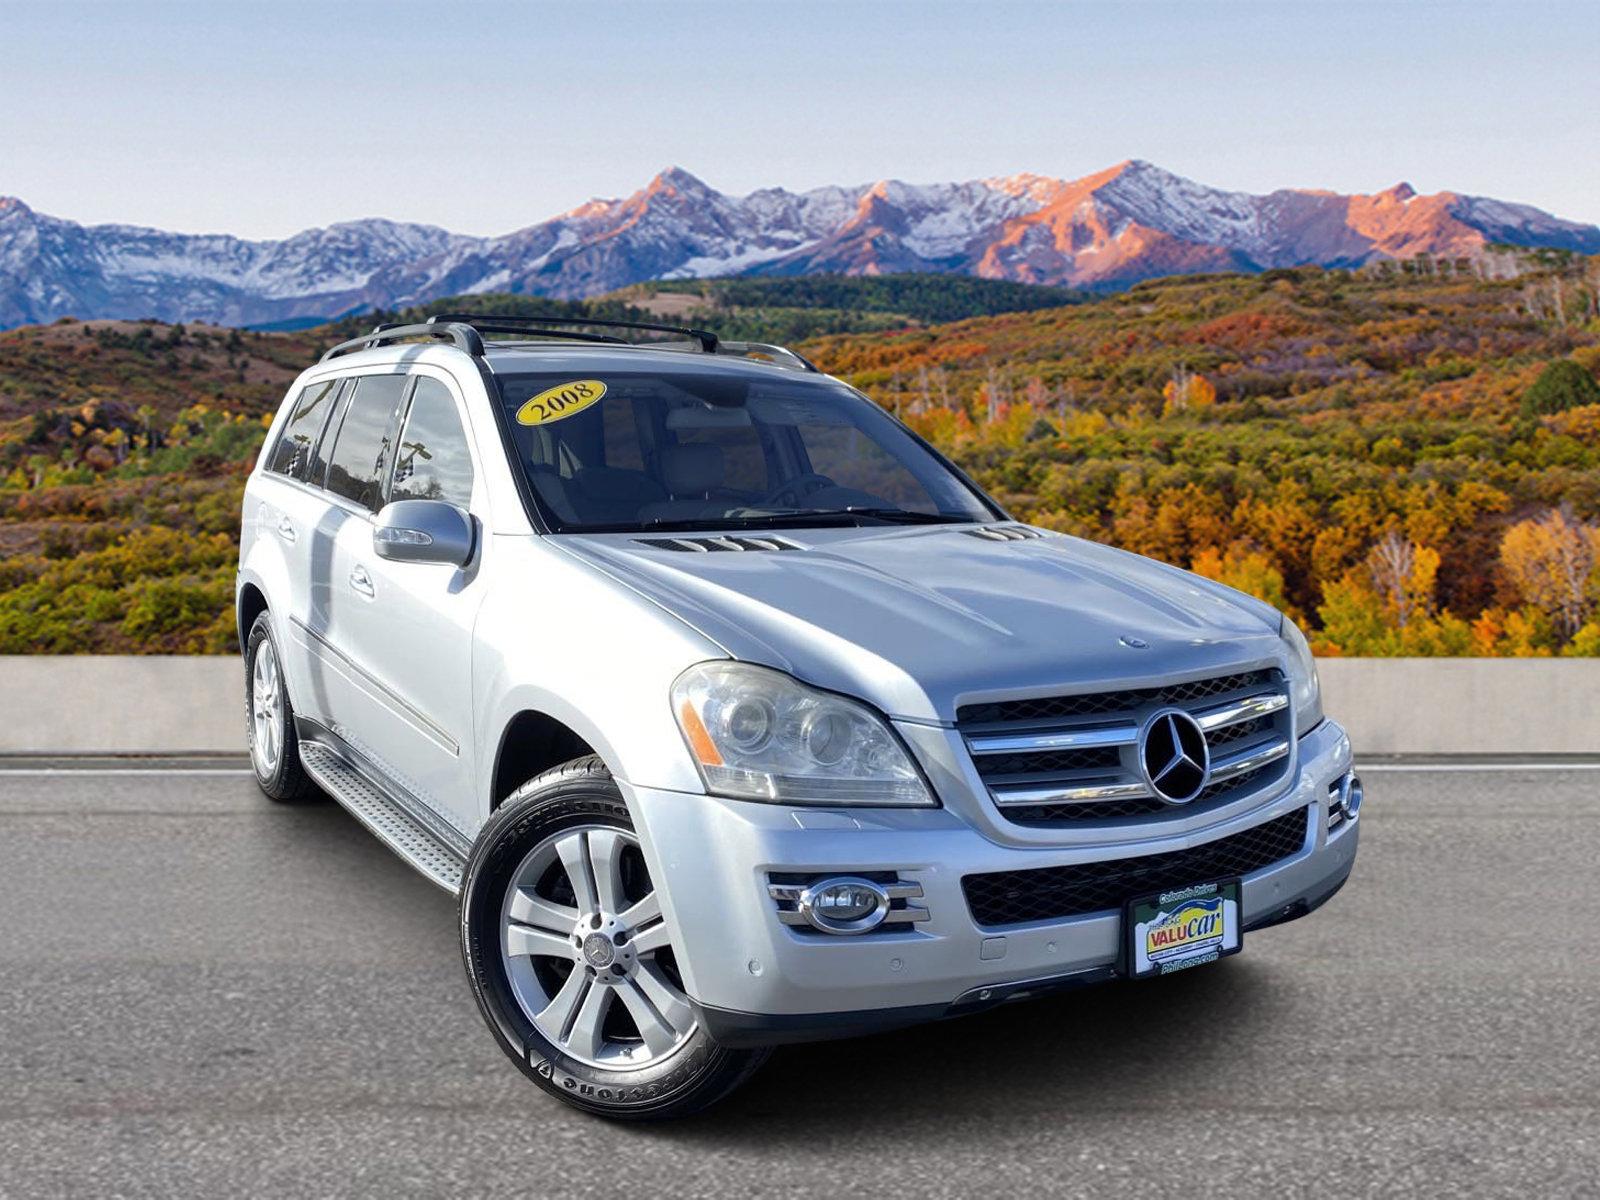 2008 Mercedes-Benz GL 320 CDI 4MATIC image